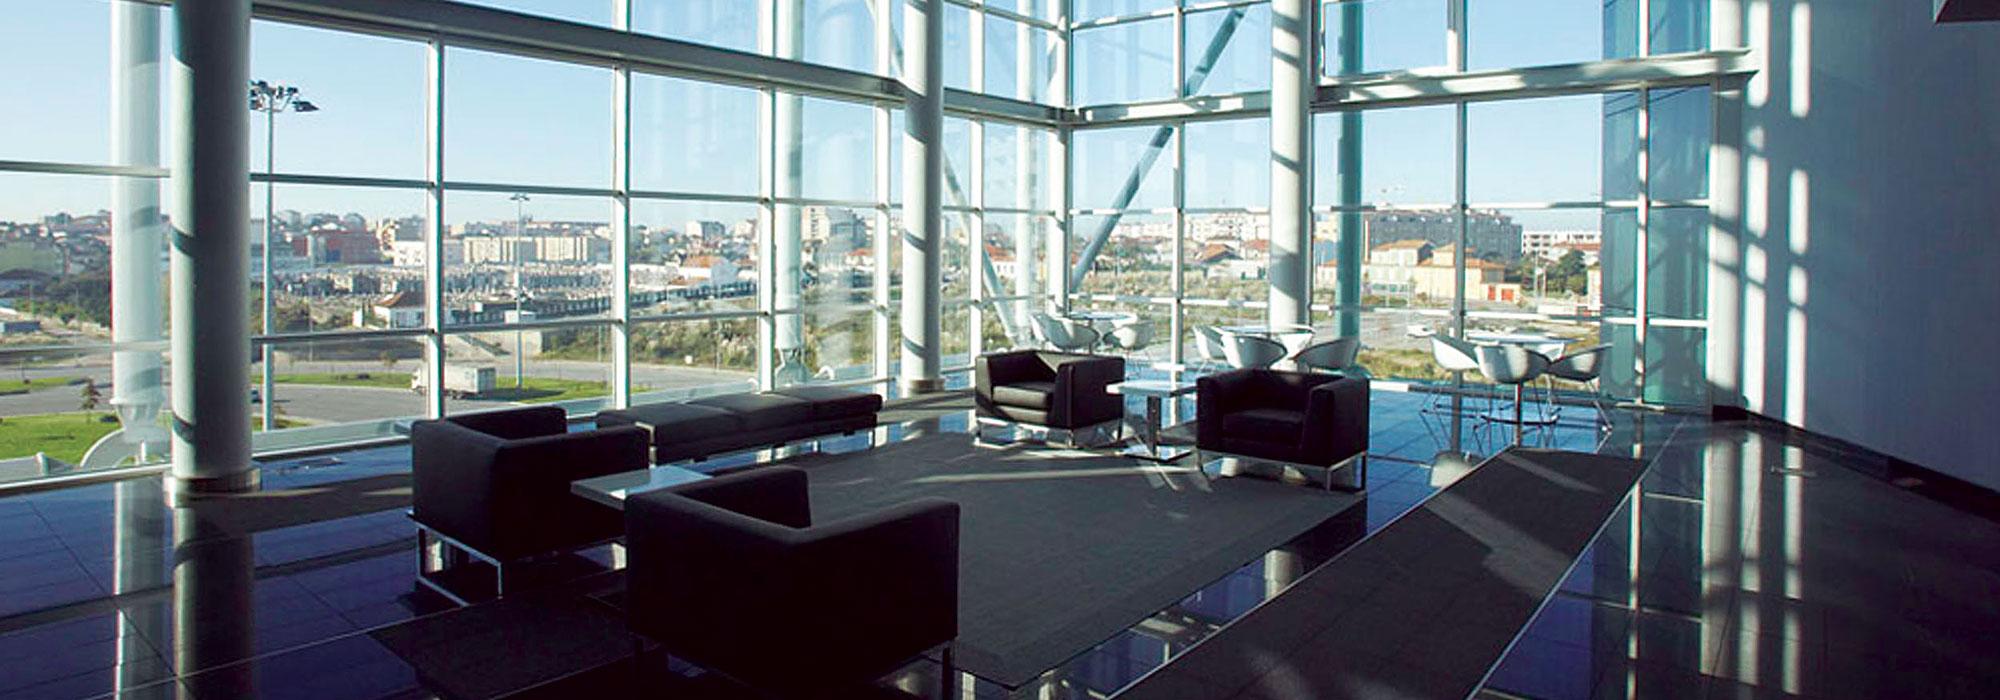 Gaianova torre plaza porto facal regino cruz for Vodafone oficinas barcelona